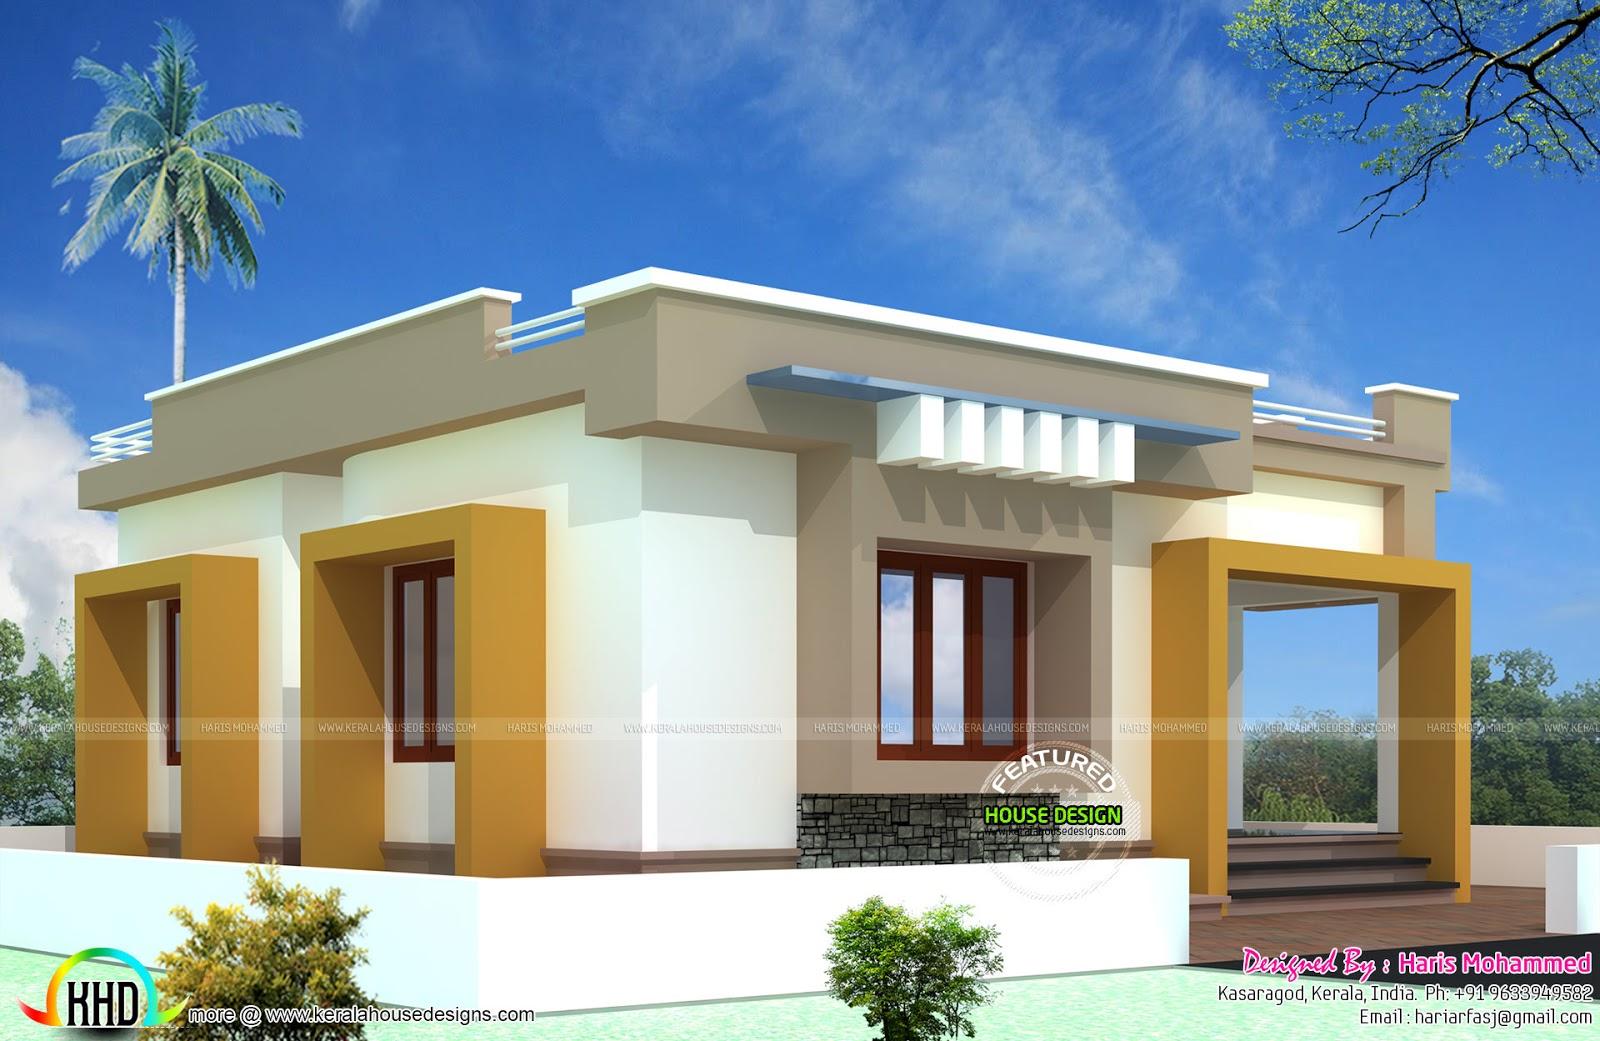 10 Lakhs Budget House Plan Kerala Home Design Bloglovin